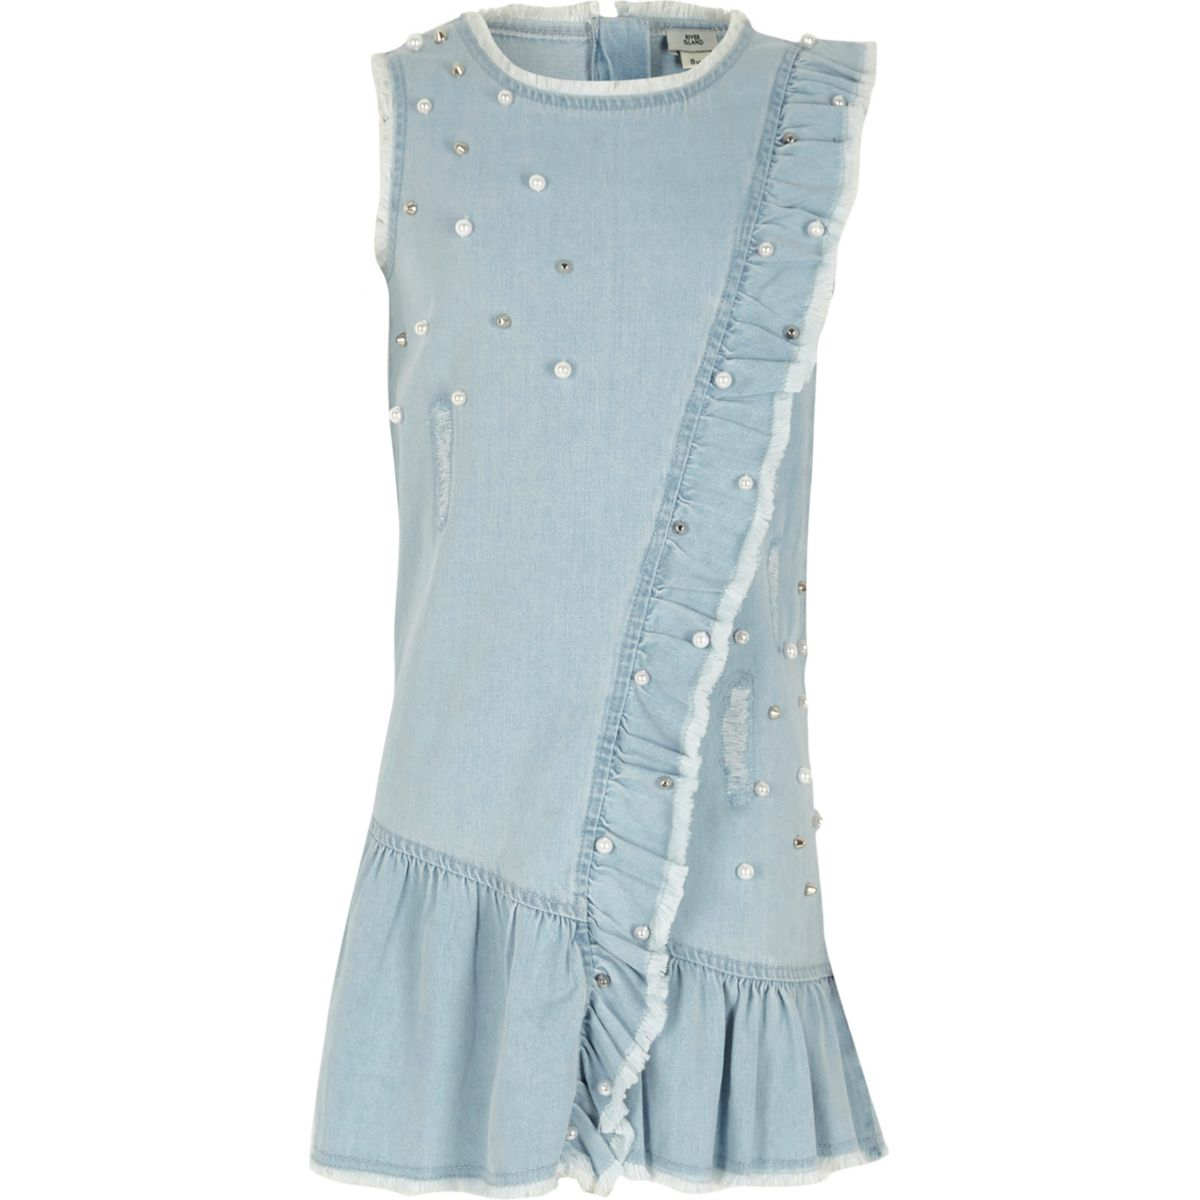 Robe en jean bleu clair ornée pour fille